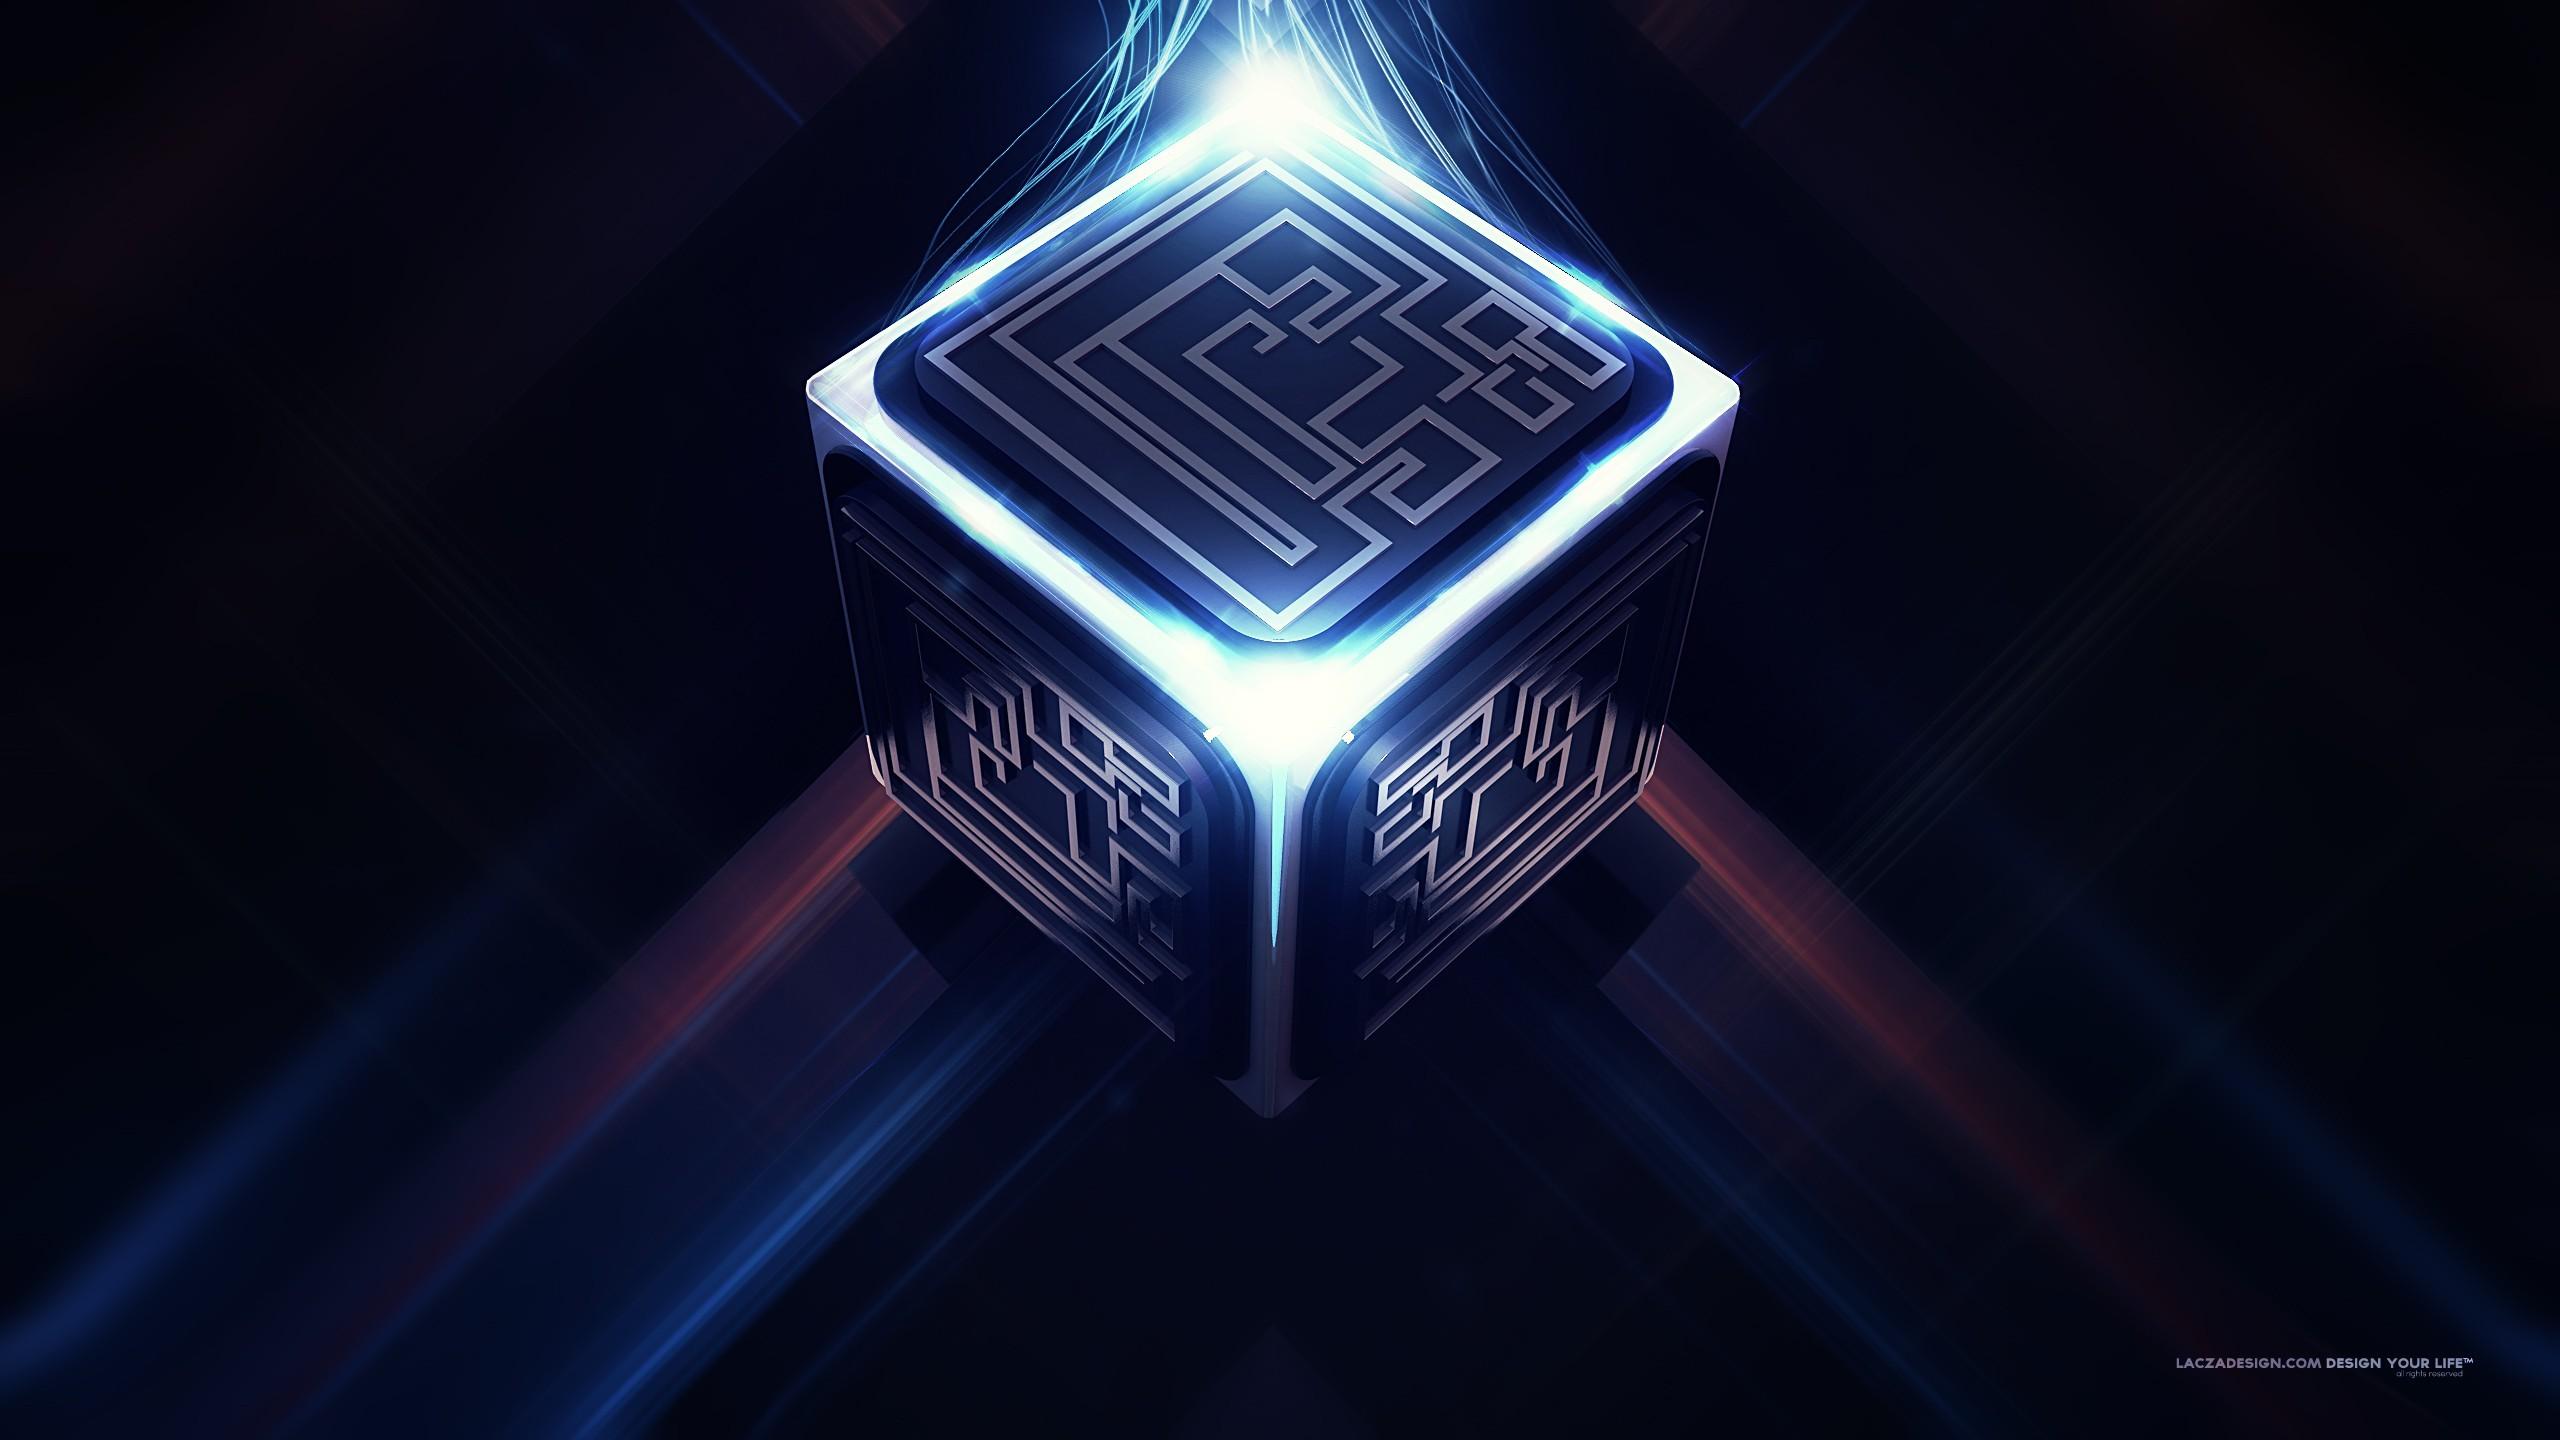 General 2560x1440 futuristic cube artwork Lacza glowing digital art abstract 3D fantasy art science fiction pattern artificial lights render CGI 3D Abstract 3D Blocks